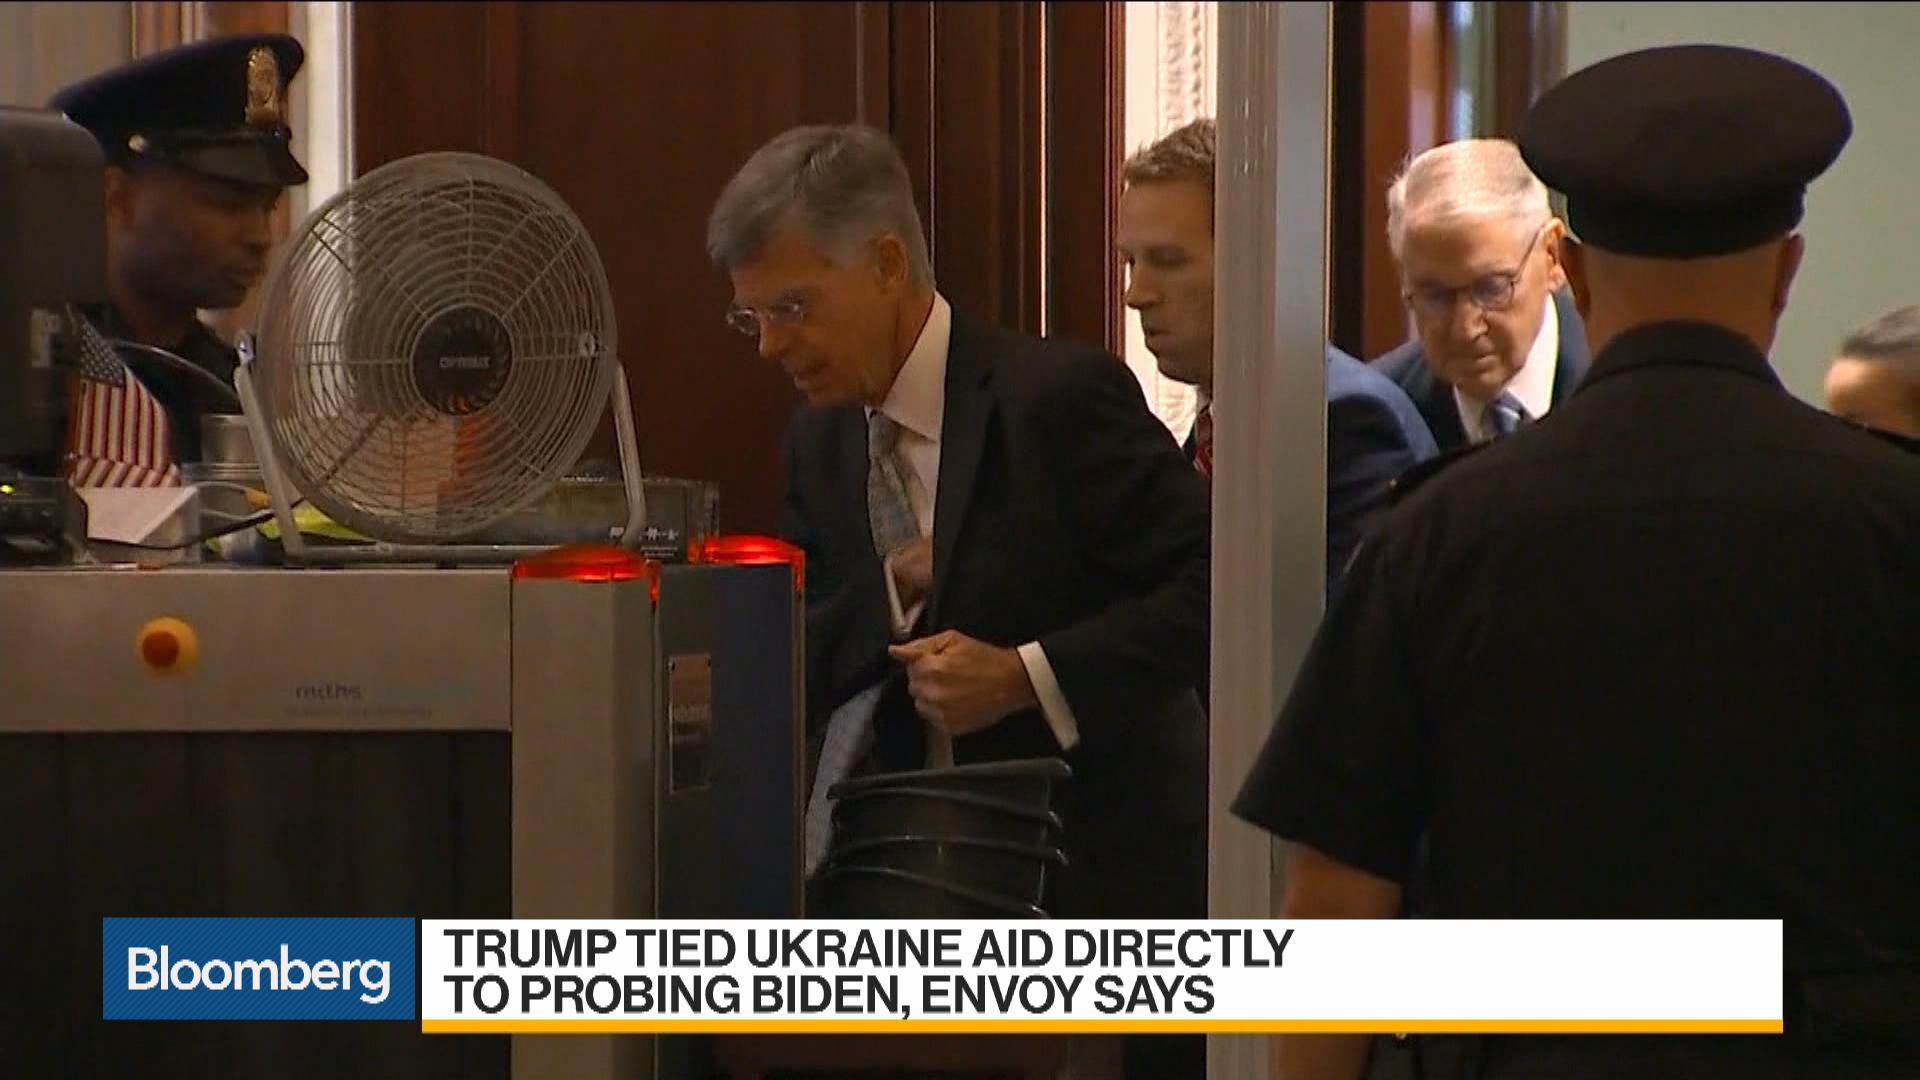 Envoy Says Trump Tied Ukraine Aid Directly to Probing Biden